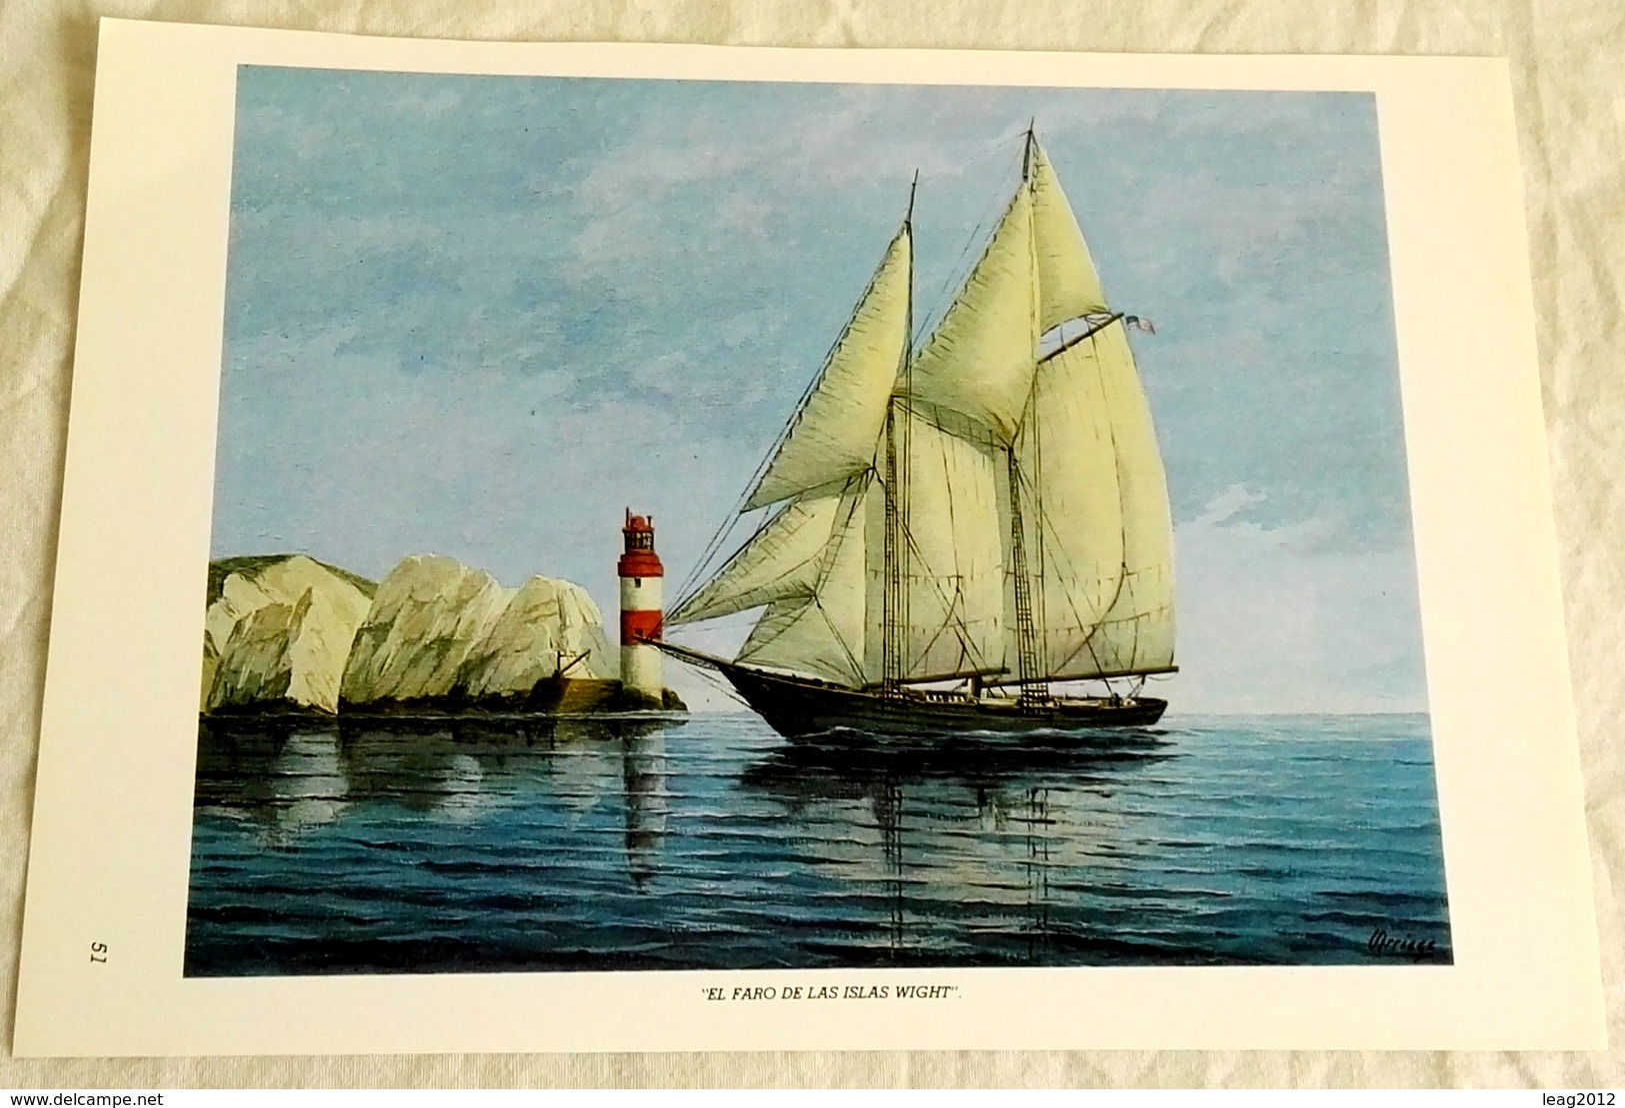 Sheet Taken From Book - Esteban Arriaga, The Lighthouse Of The Wight Islands / 1986 - Arte